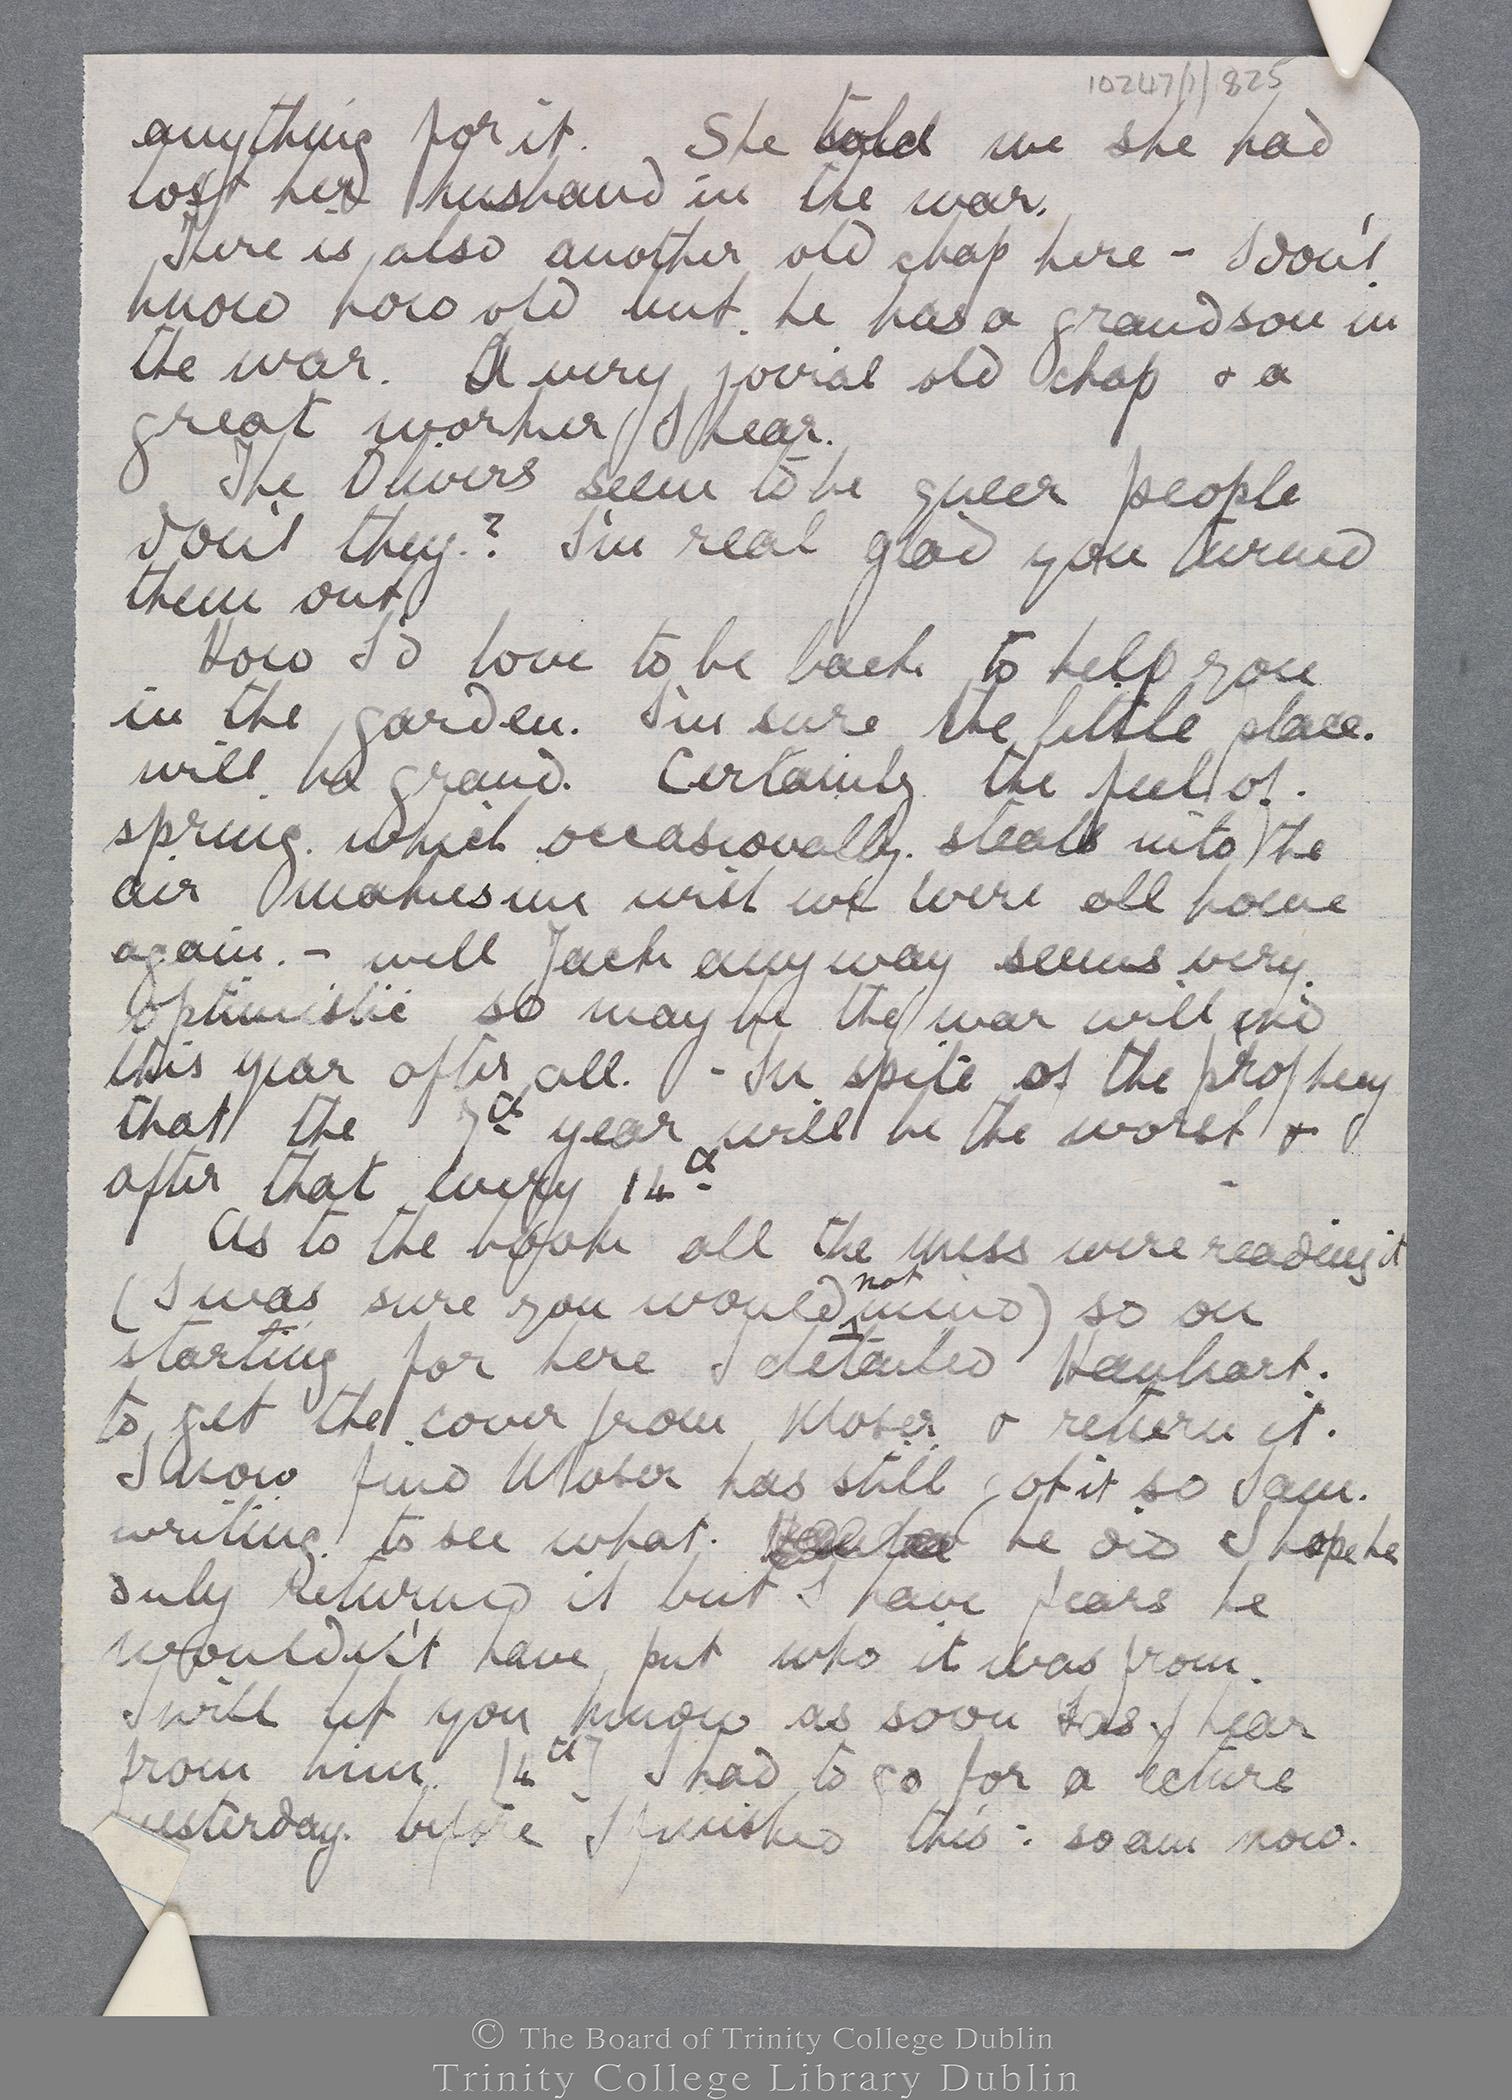 TCD MS 10247/1/825 folio 3 recto